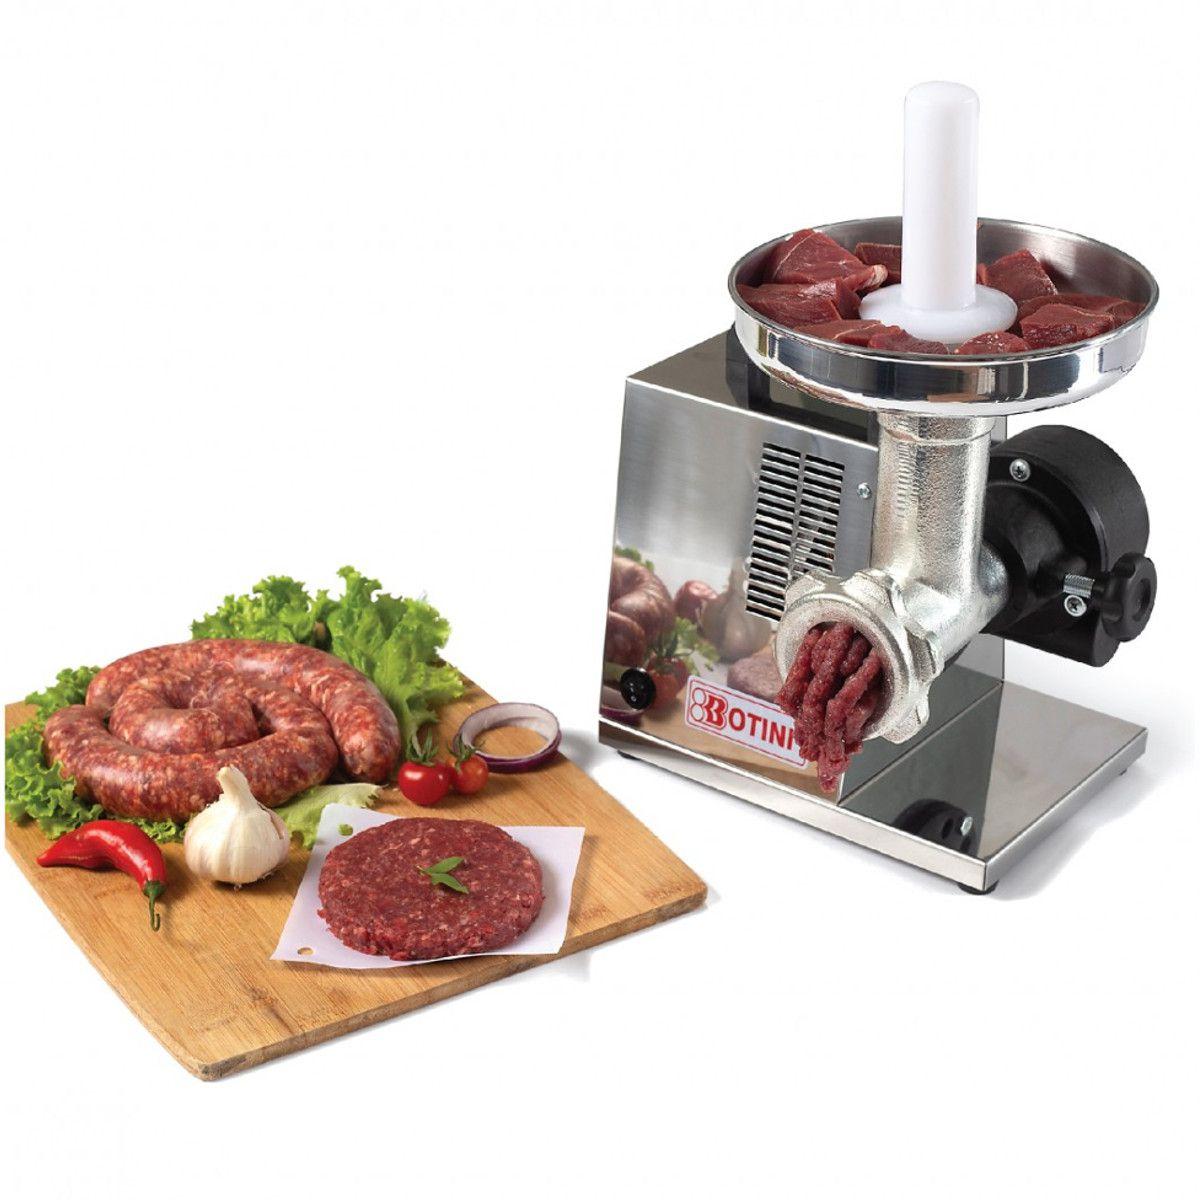 Moedor Elétrico Multiuso de Carne e Massas Bivolt B05 Gourmet - Botini